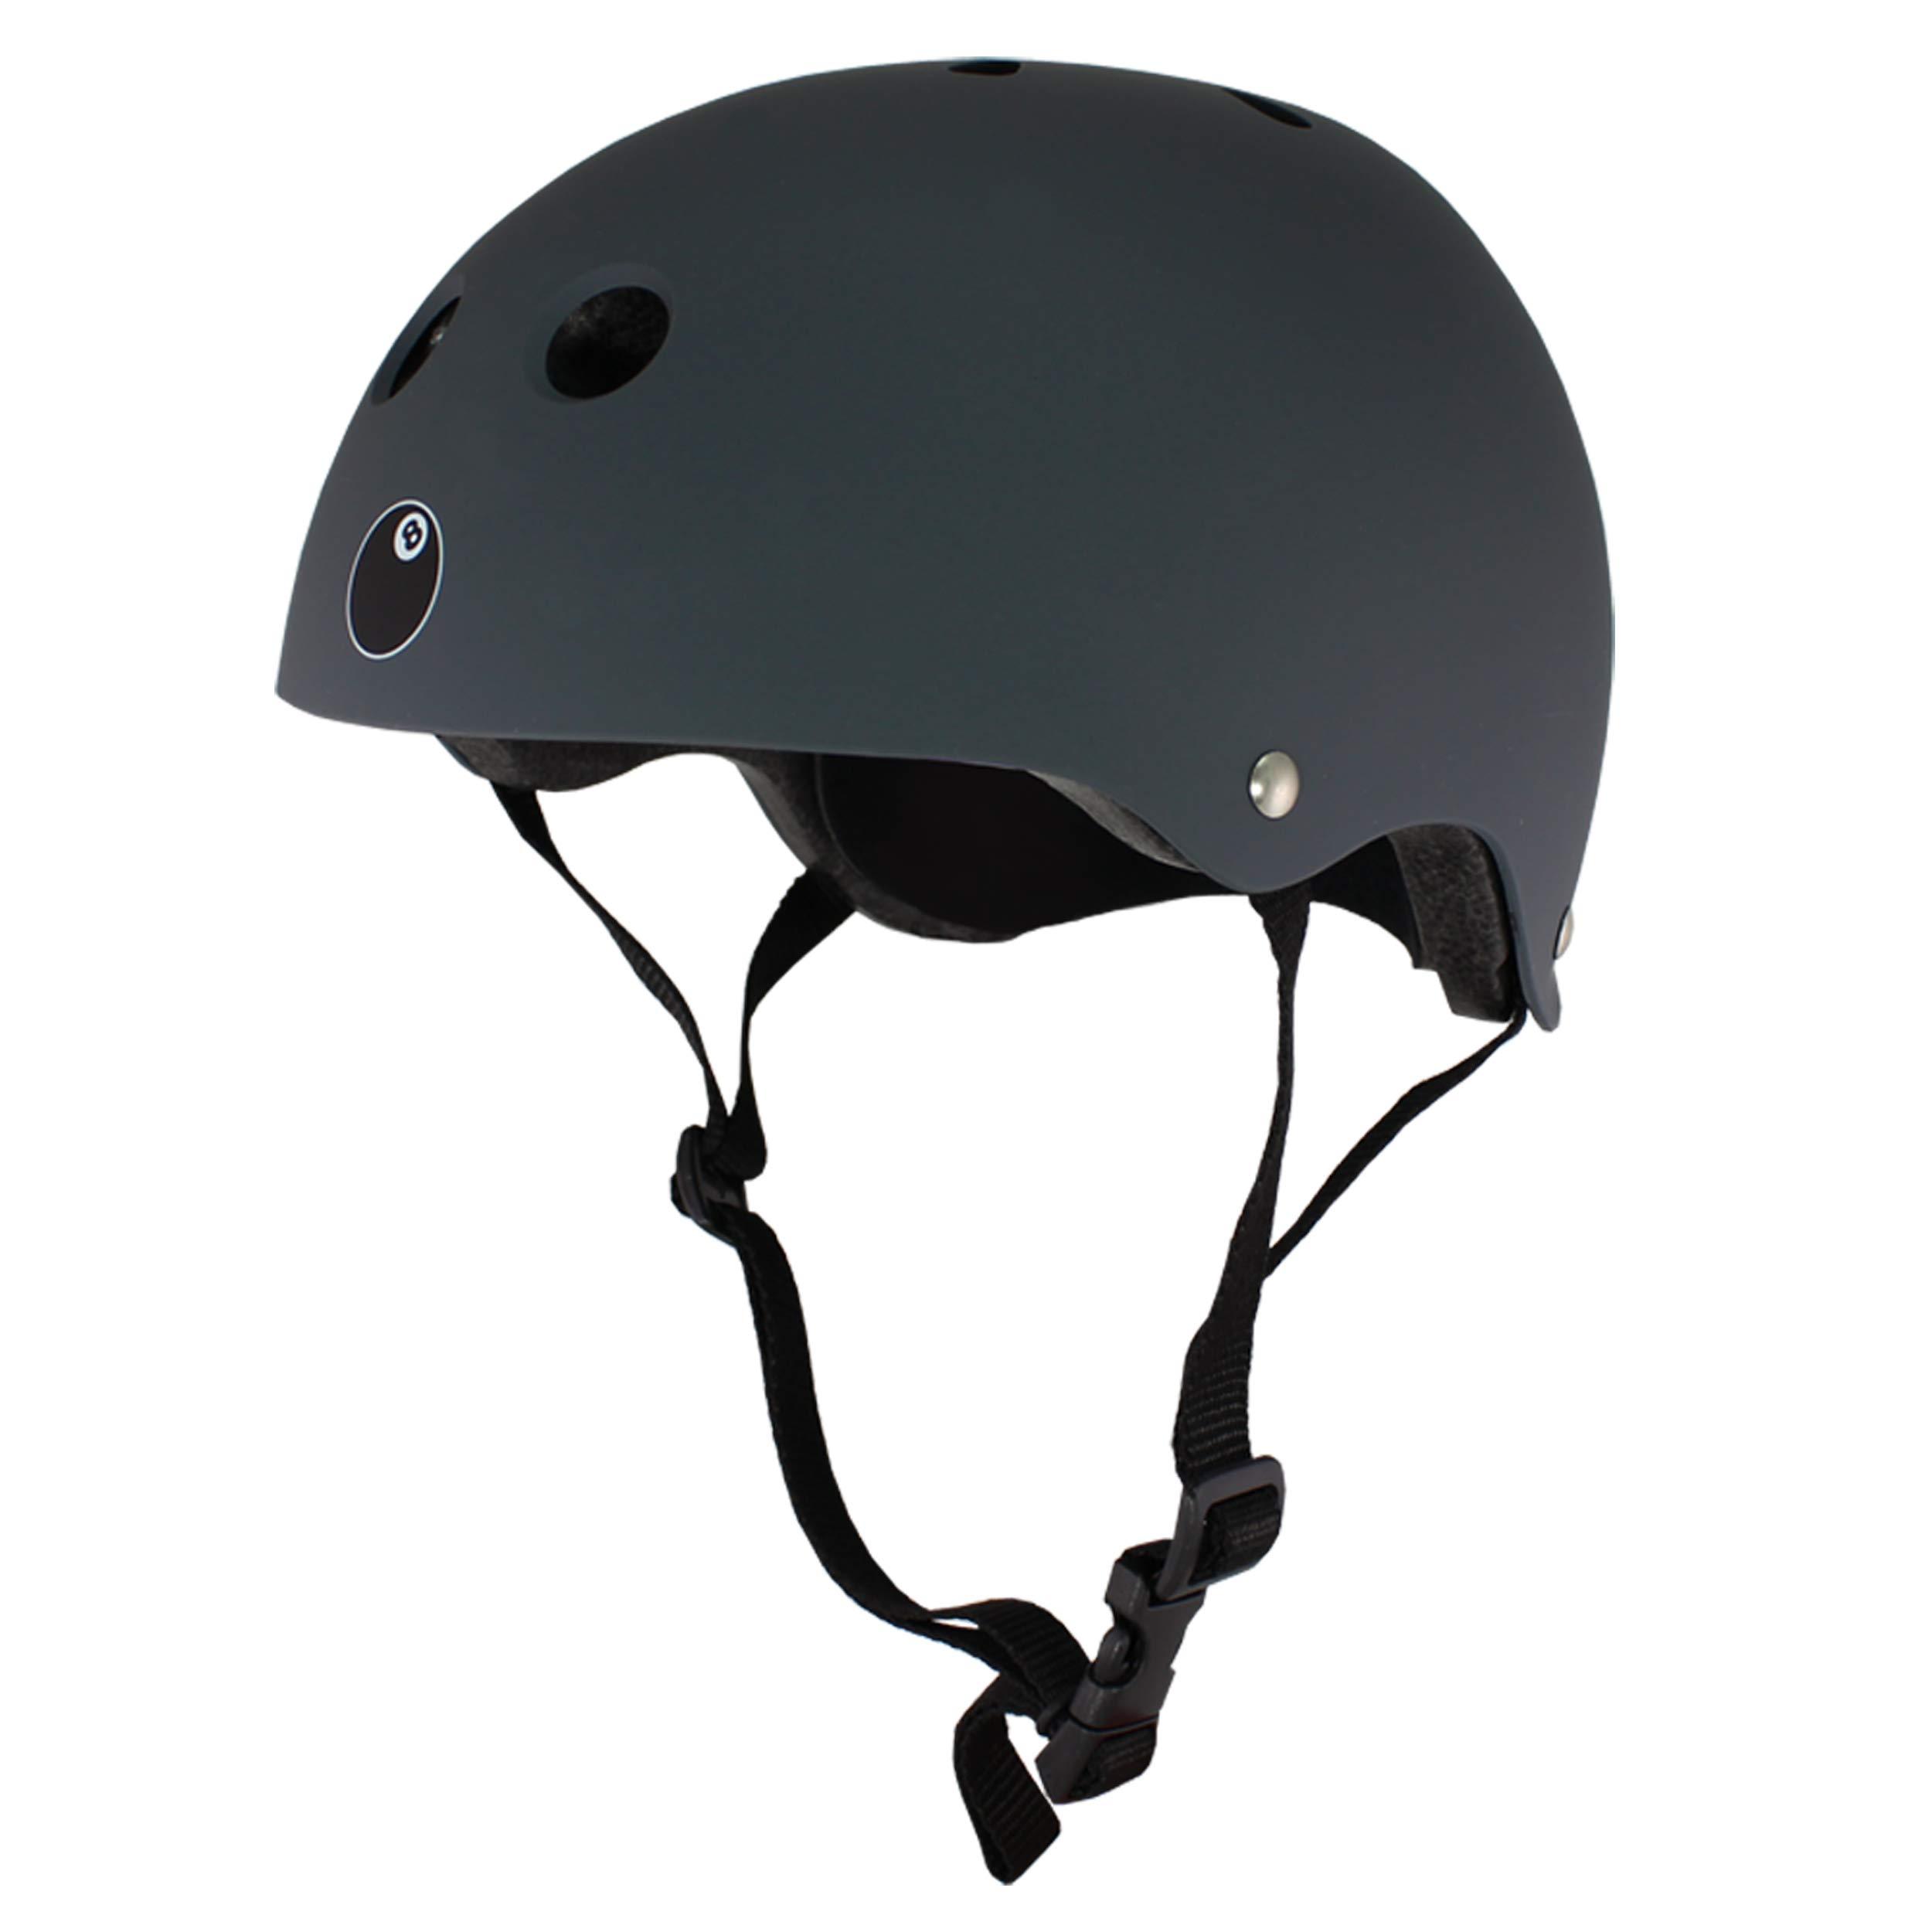 Eight Ball Dual Certified Kids Helmet for Bike, Skate, and Scooter, Gun Matte